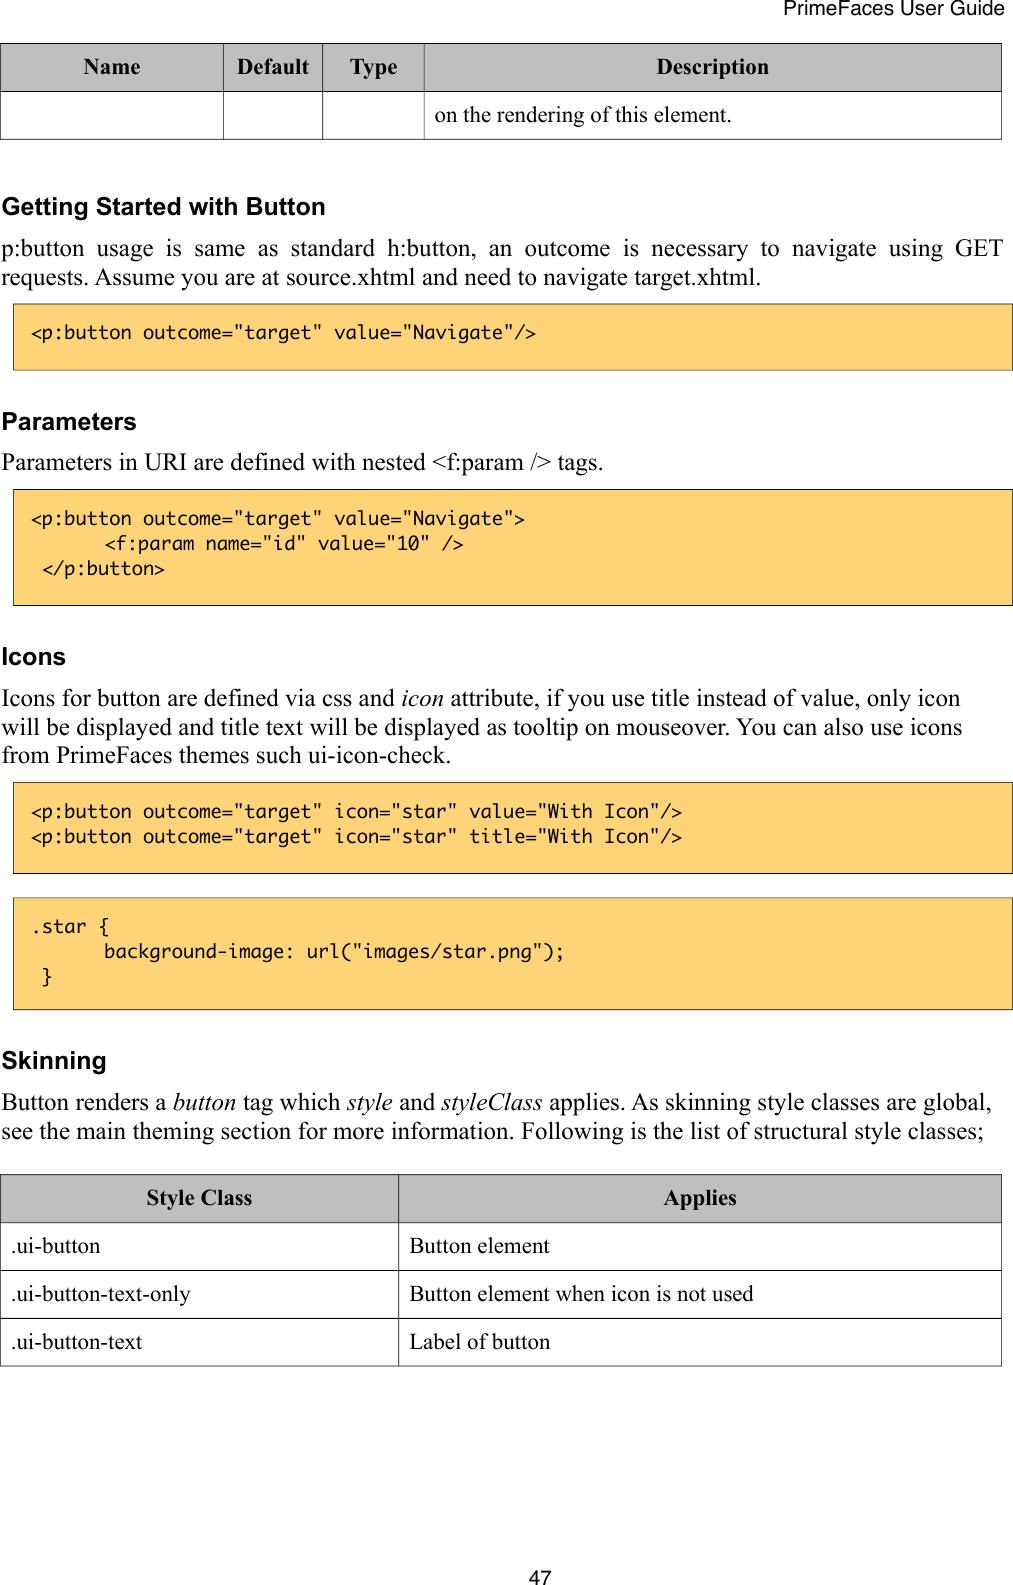 Primefaces User Guide 6 1